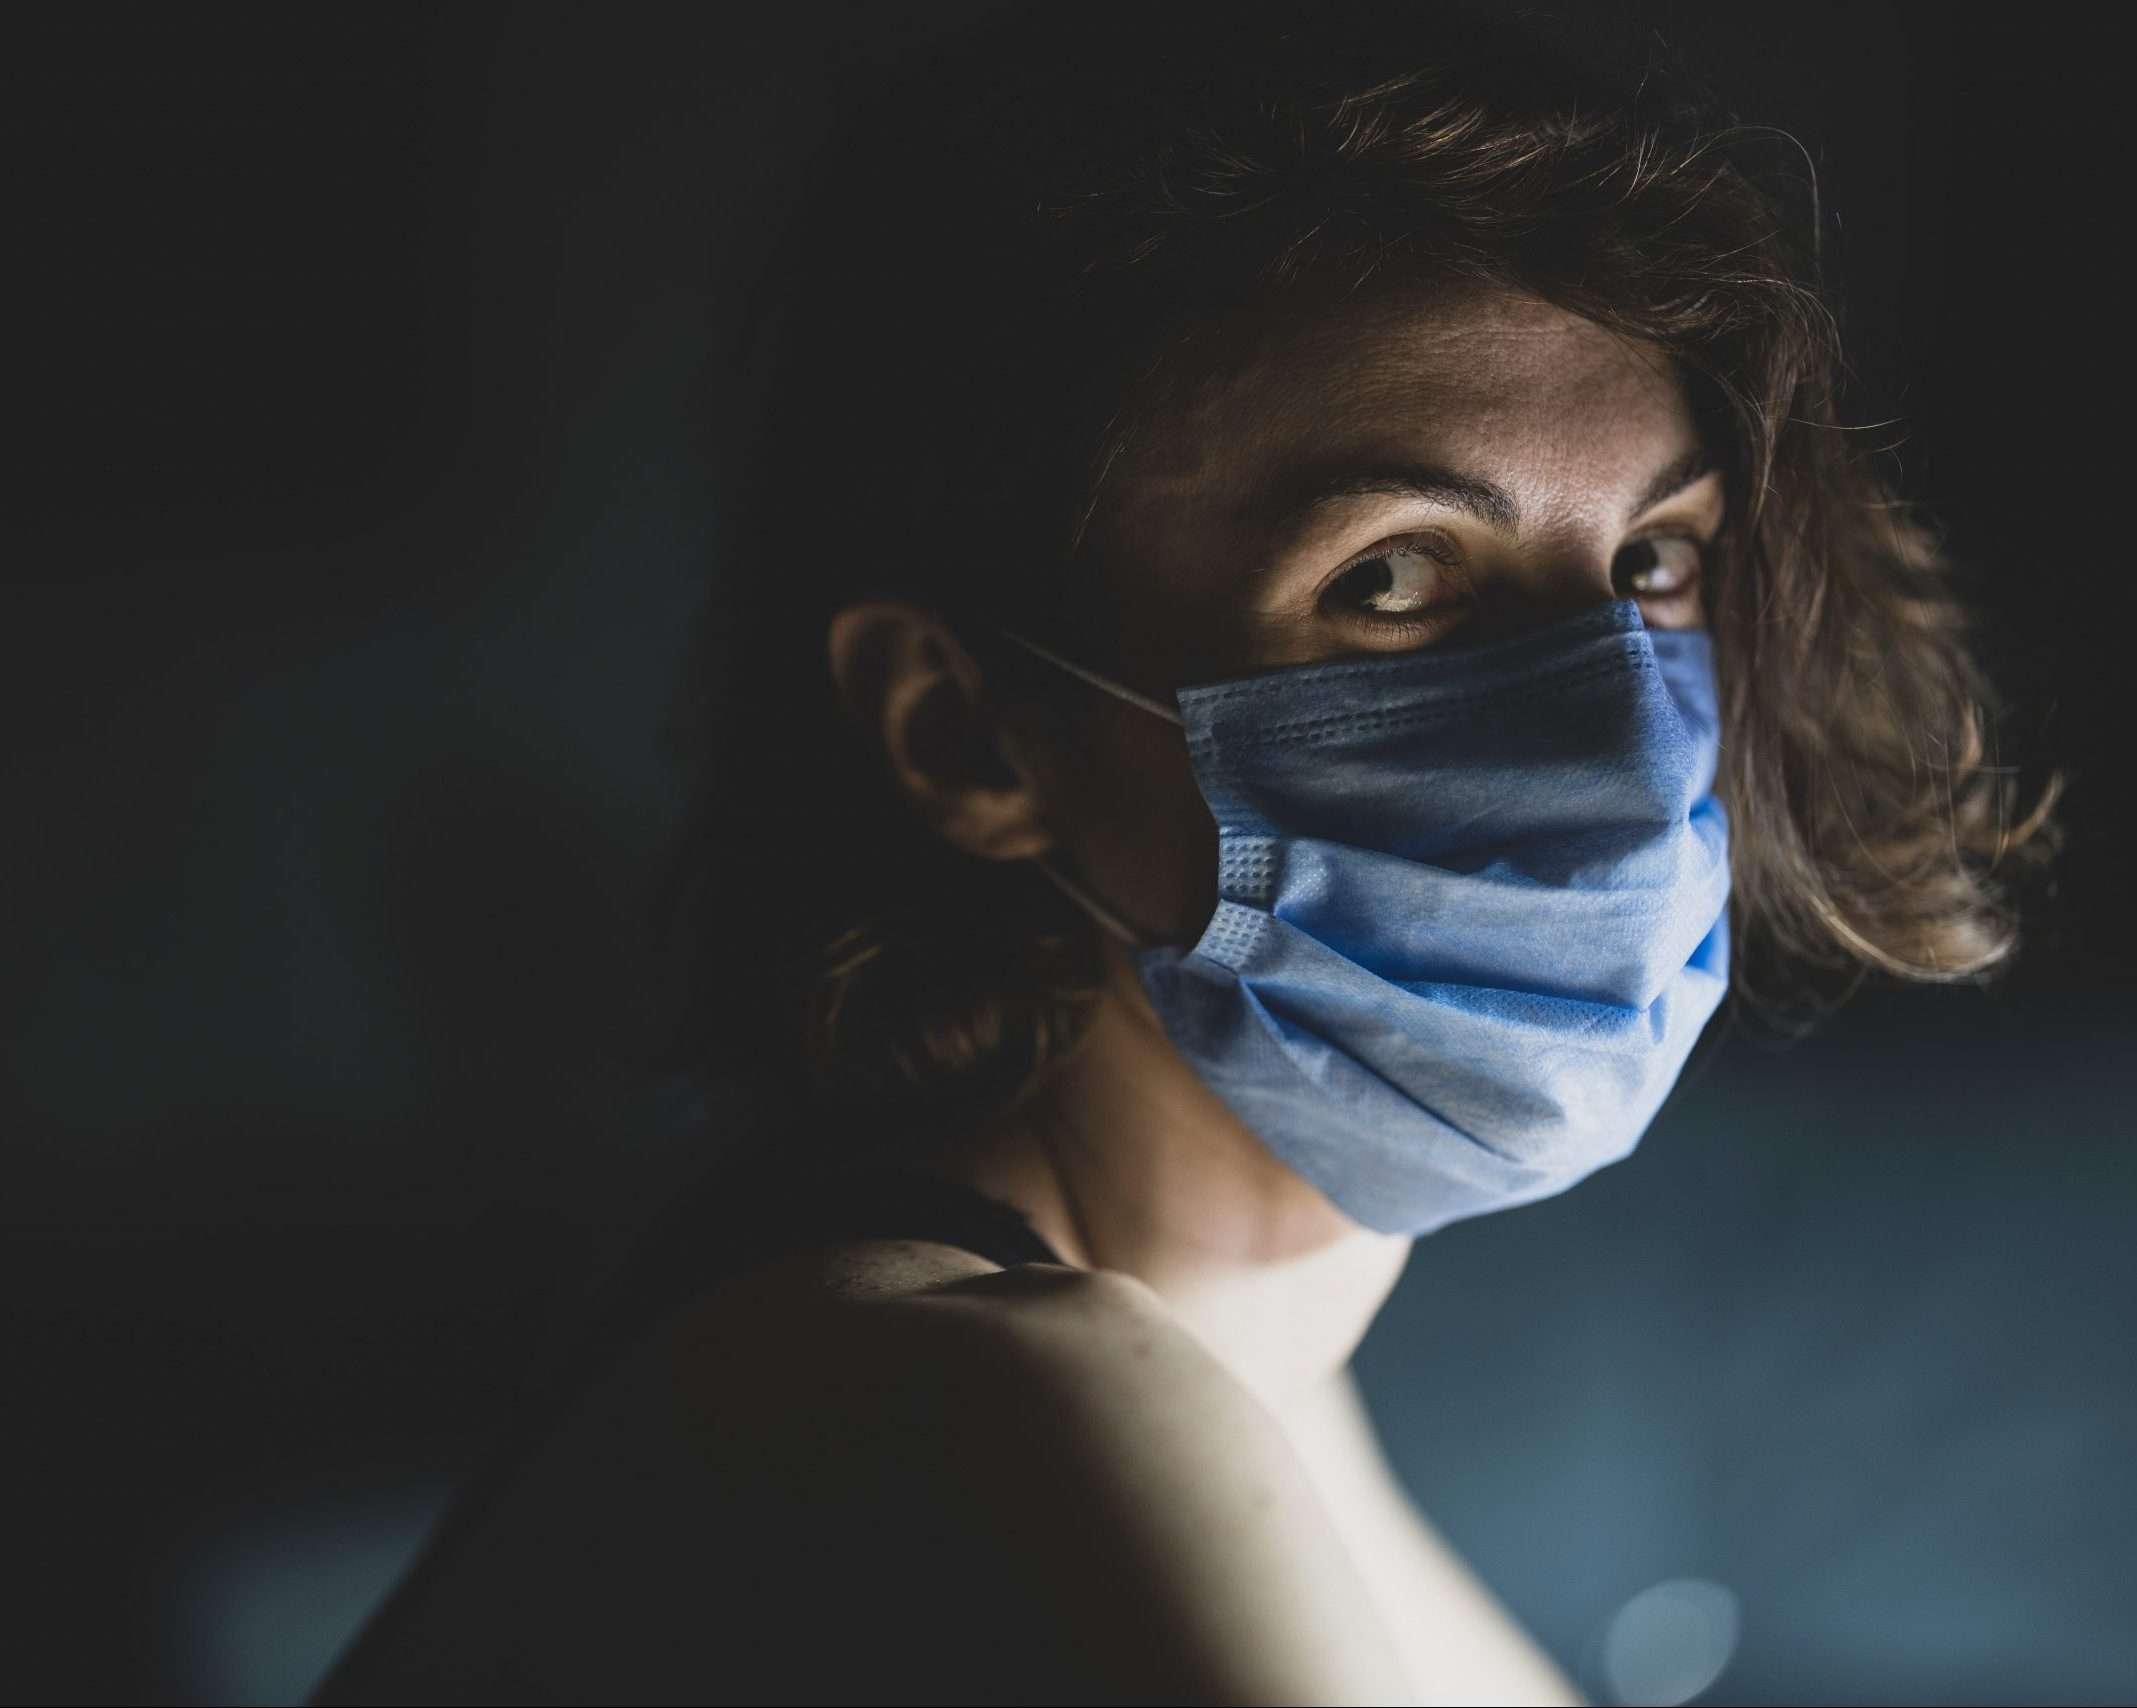 DAUK in Medscape: Medics on the Move